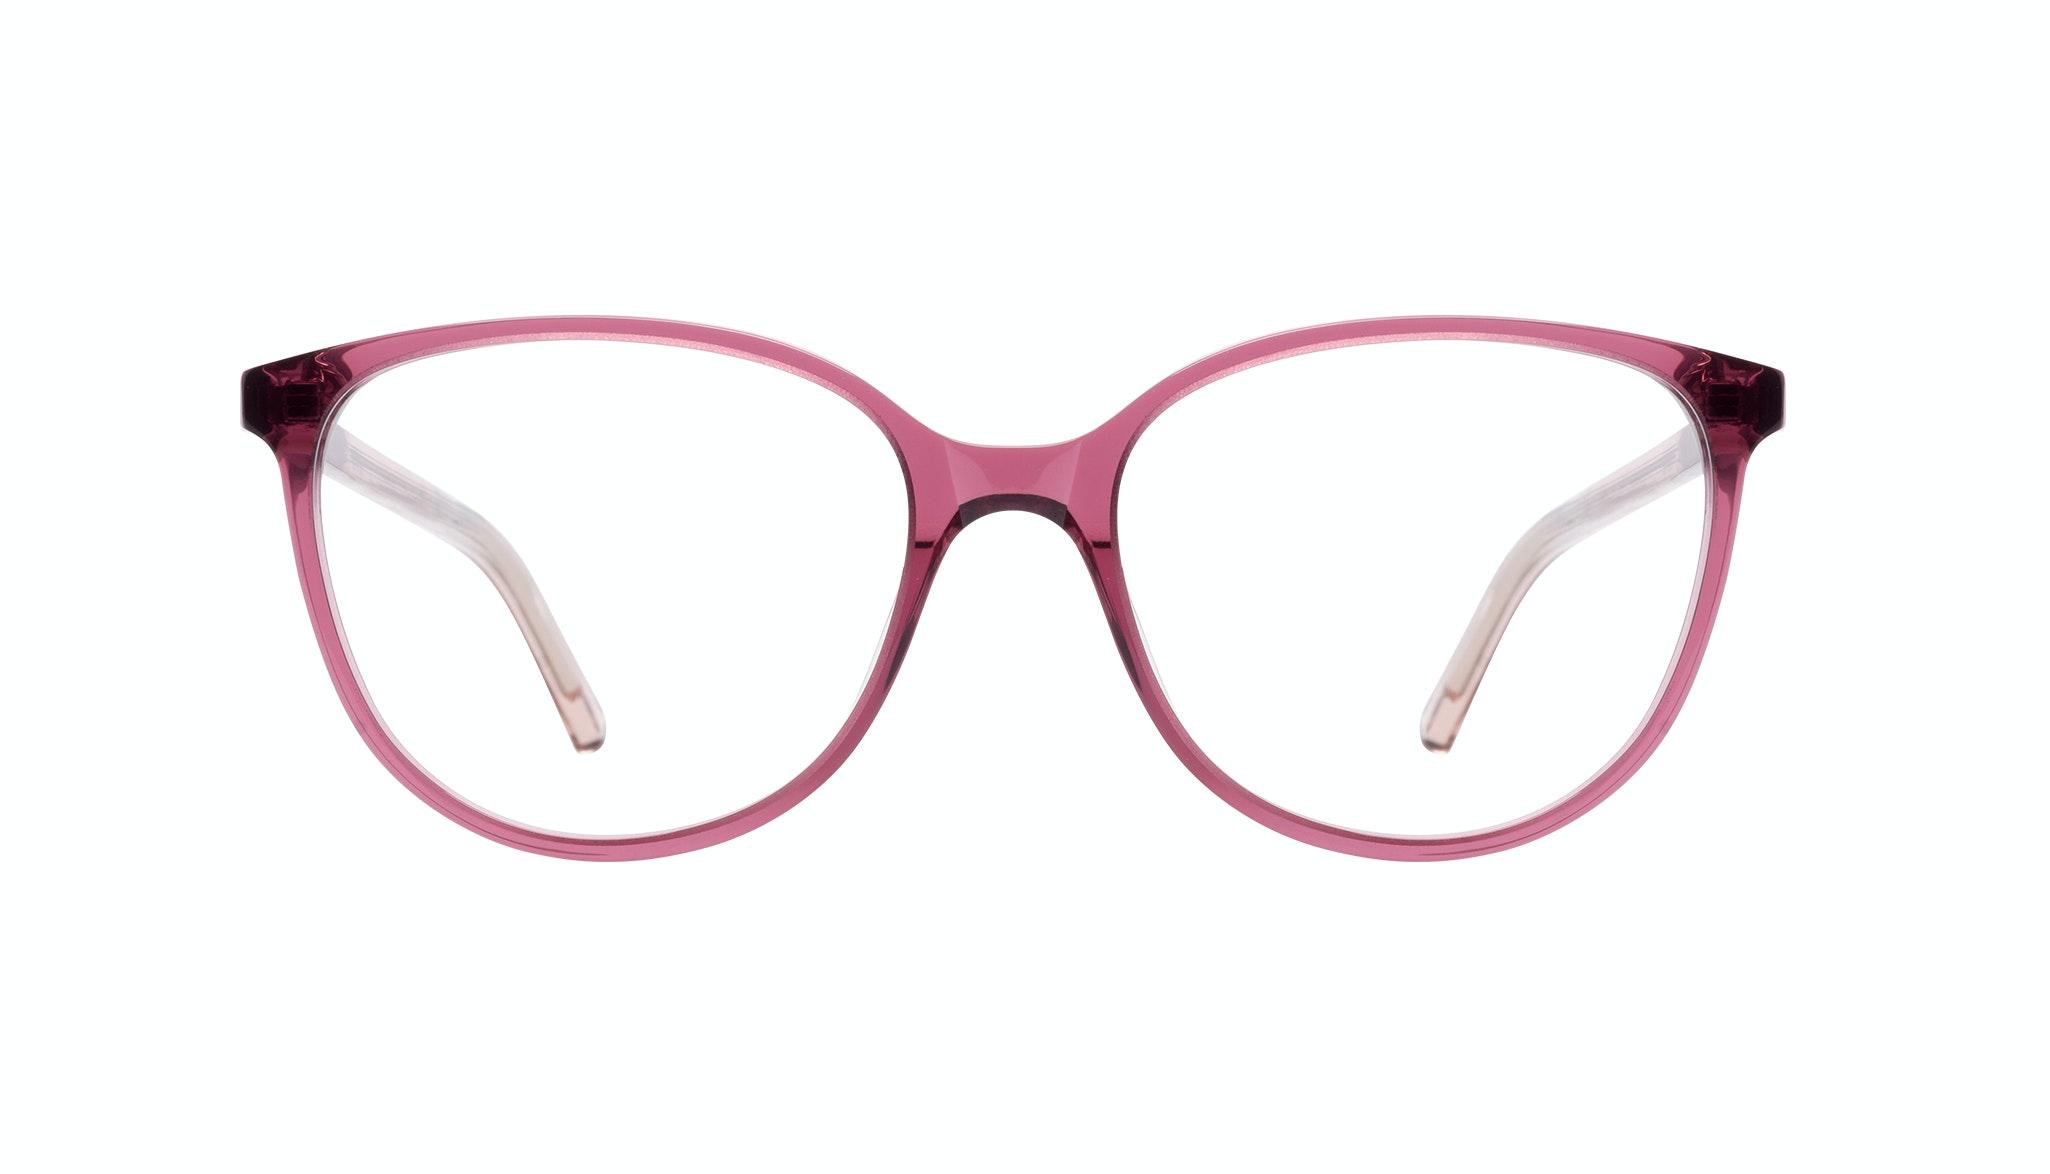 Affordable Fashion Glasses Round Eyeglasses Women Imagine Petite Berry